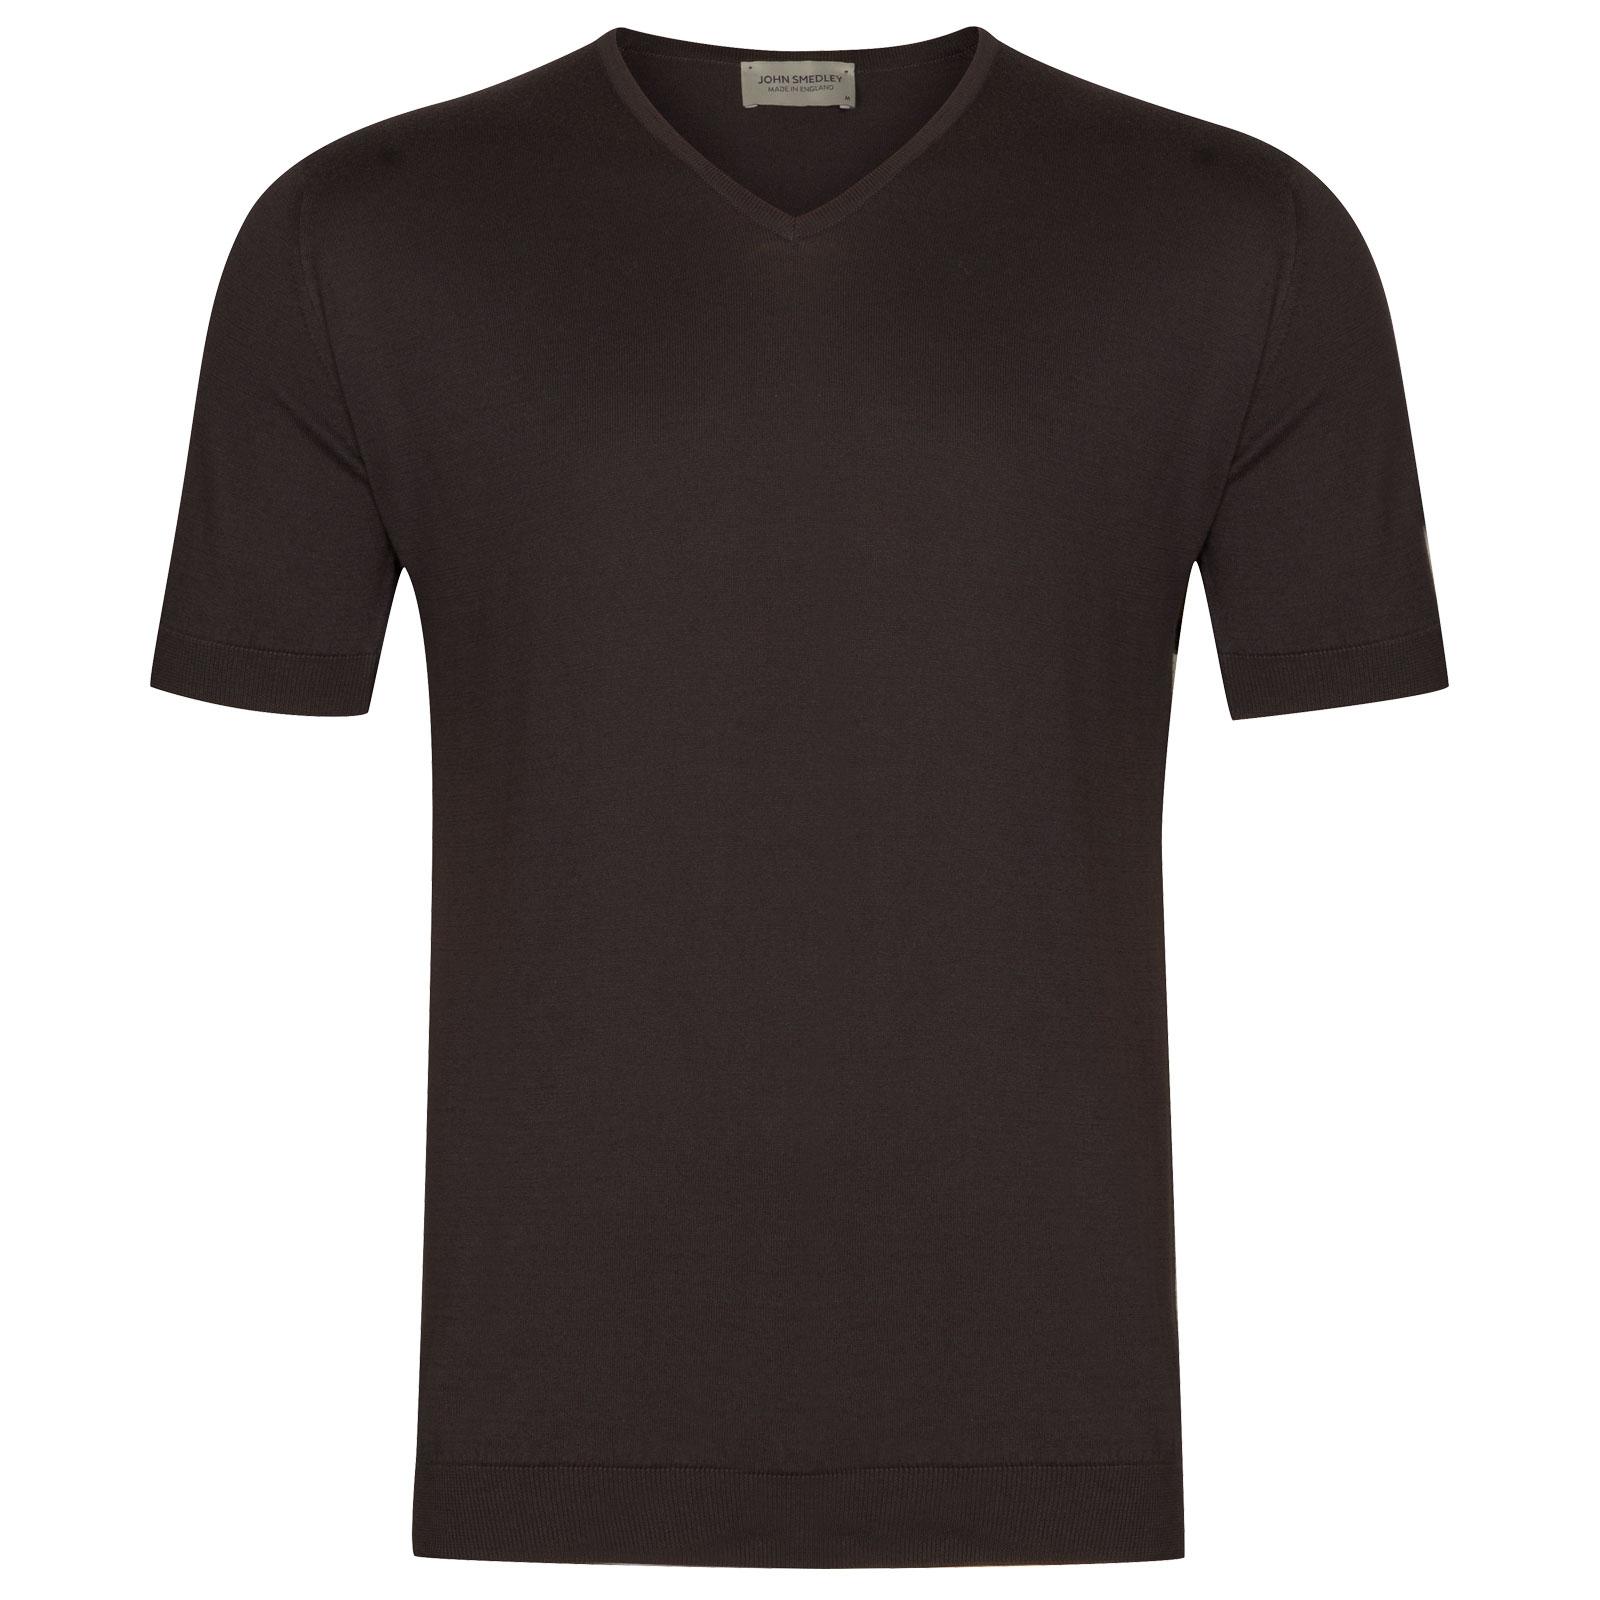 John Smedley Braedon in Flannel Grey T-Shirt-XXL